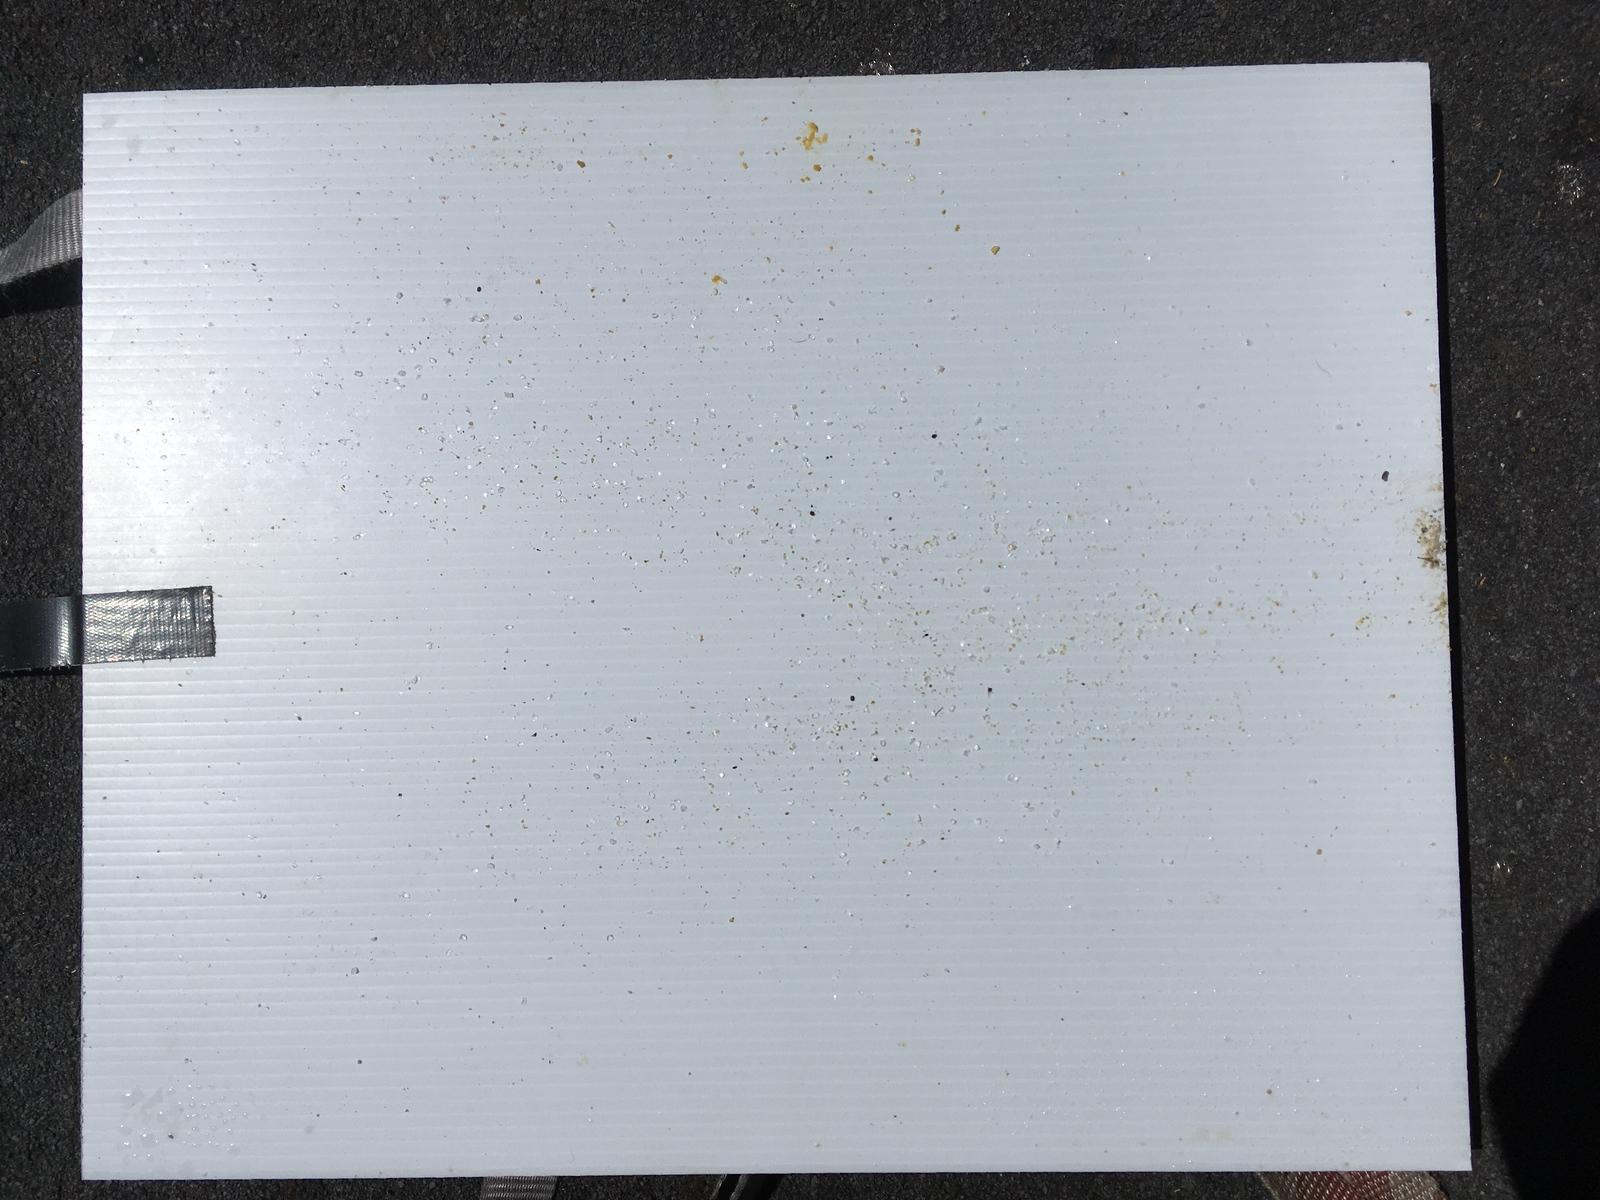 USA GAS Head VAROMOR MINI SMOKE CANNON Vaporiser Evaporator treatment varroa